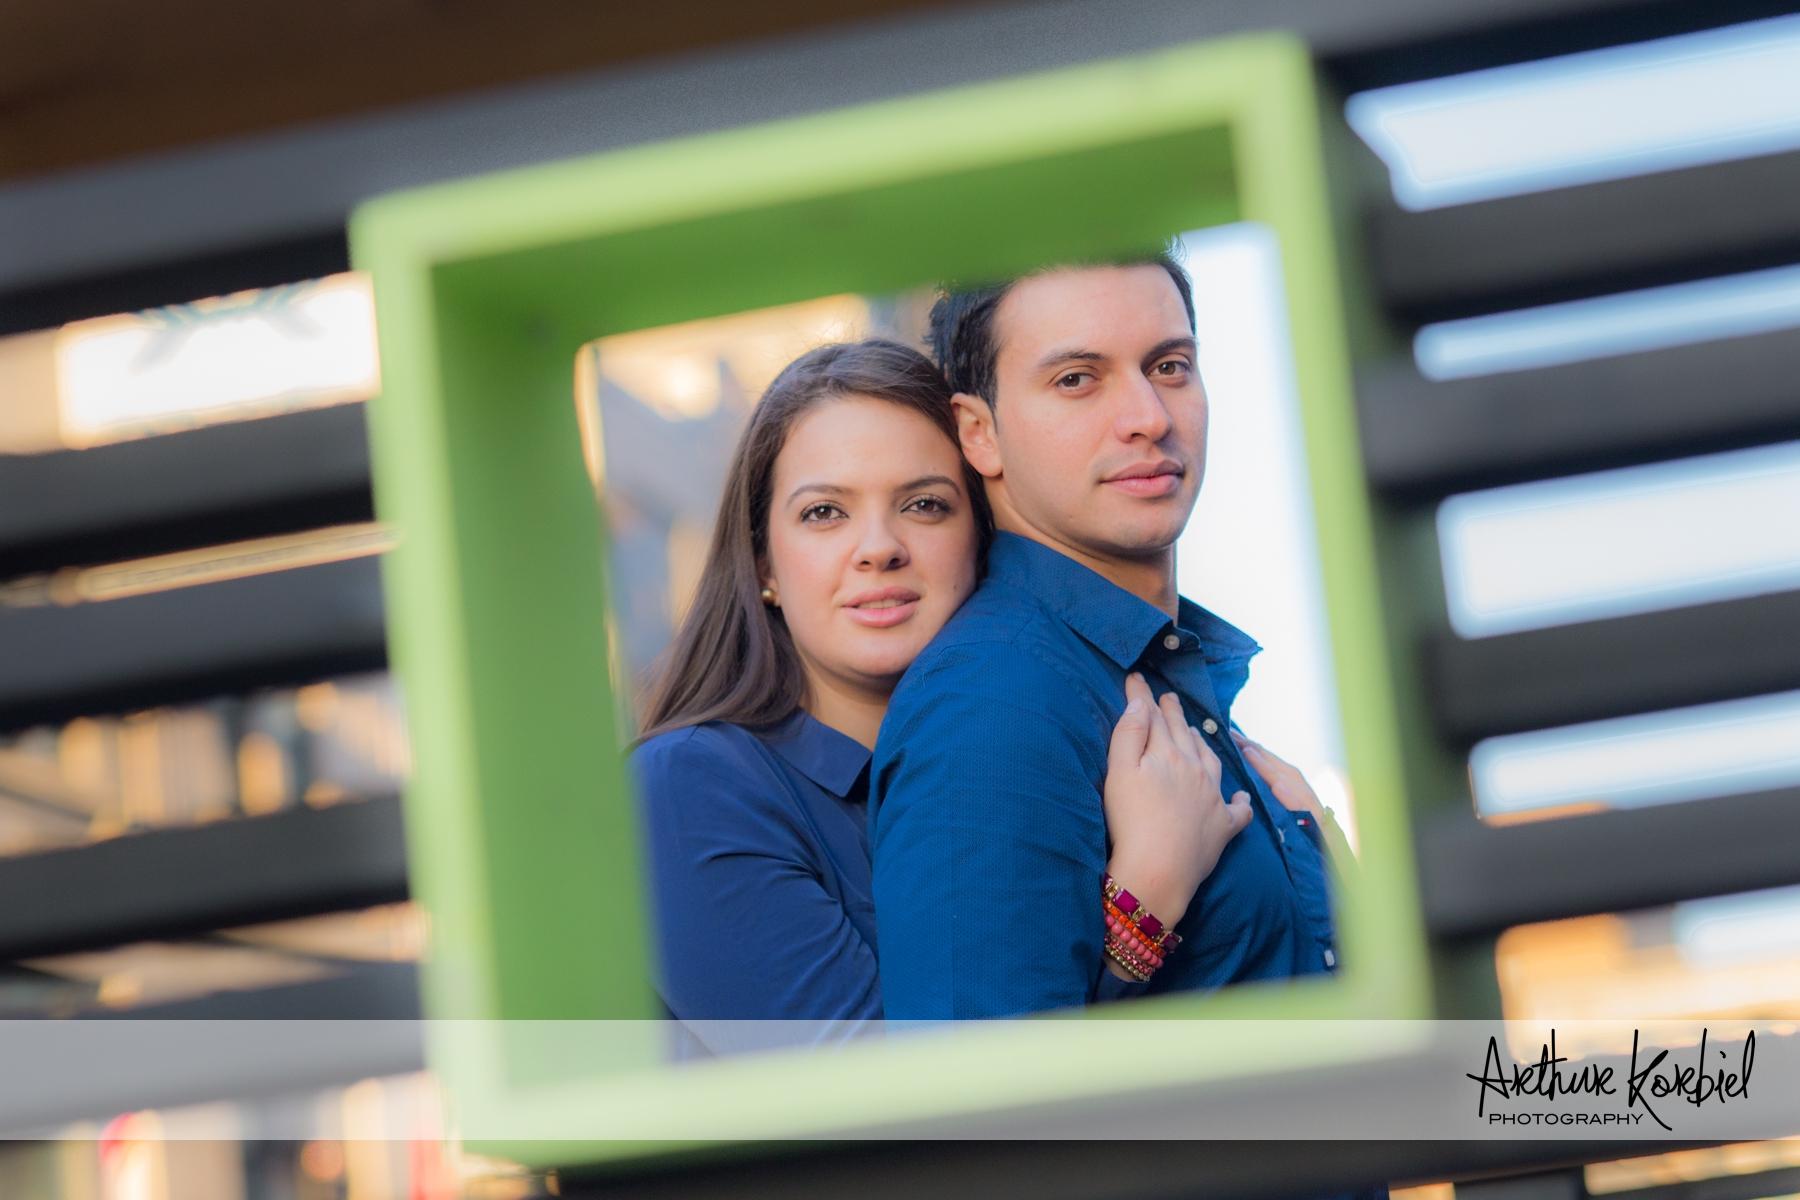 Arthur Korbiel Photography - London Engagement Photographer - Maria & Jose-007.jpg